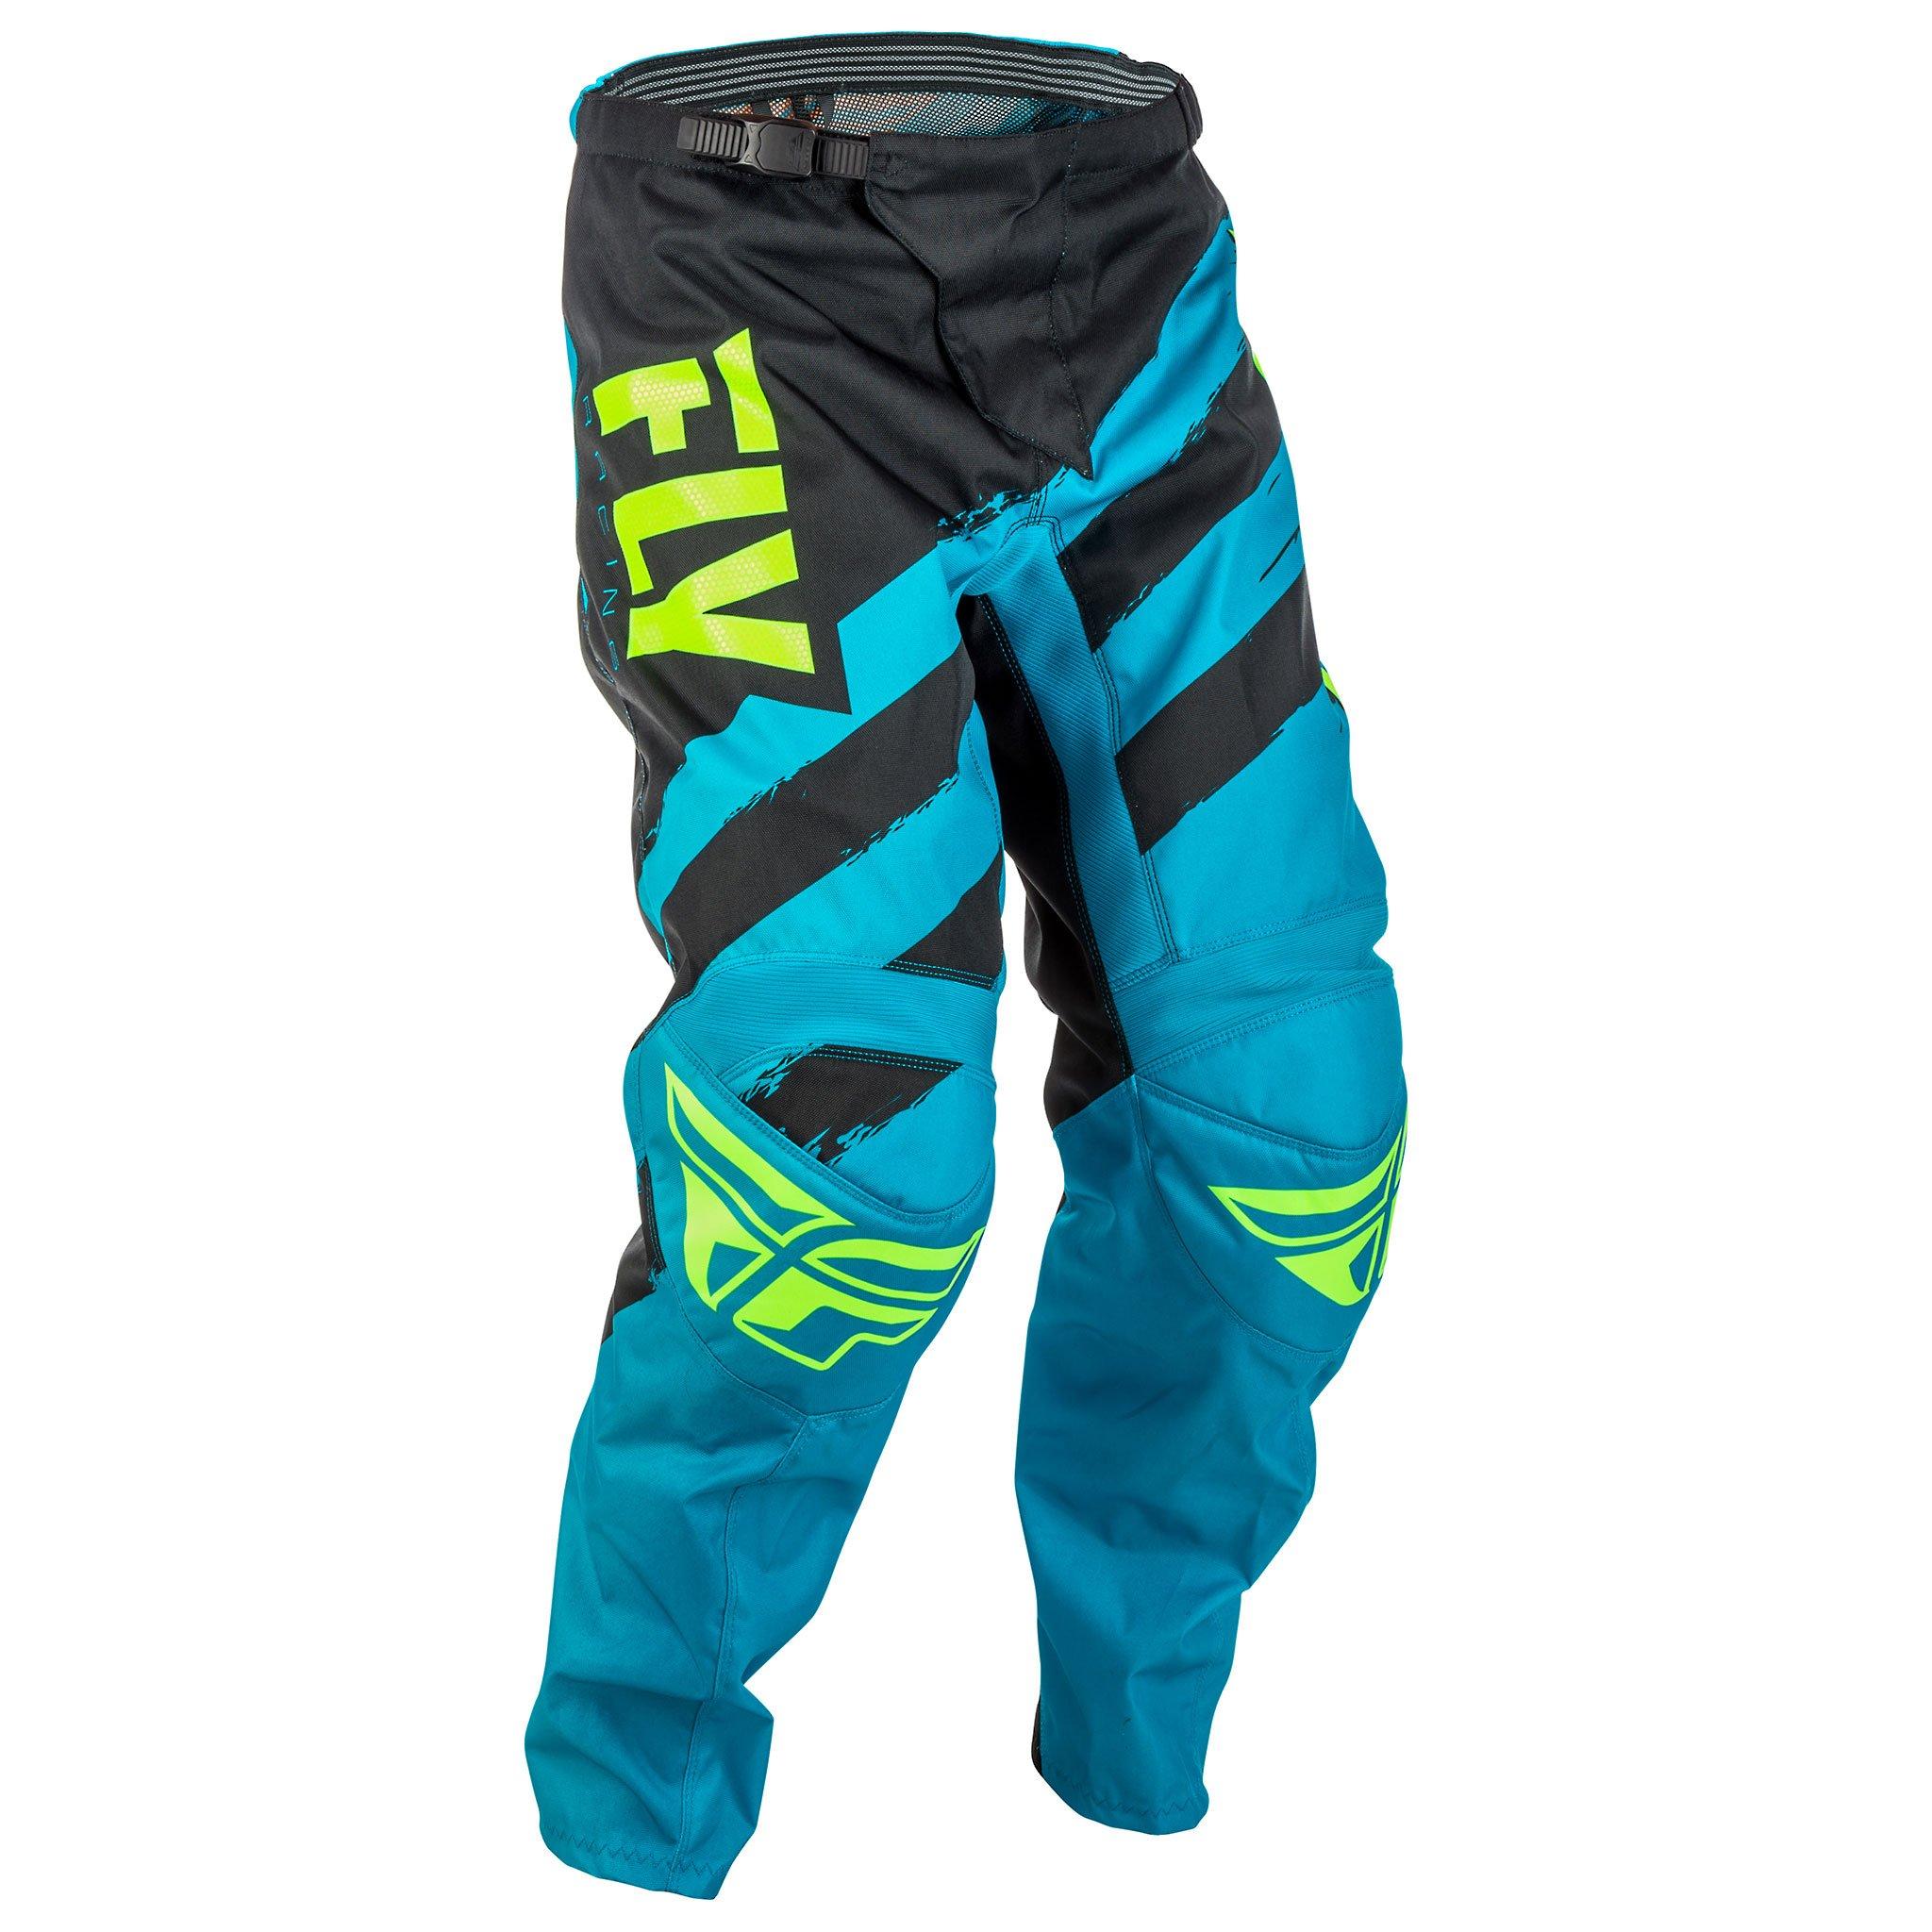 Fly Racing Men's Pants (Blue/Black, Size 18)